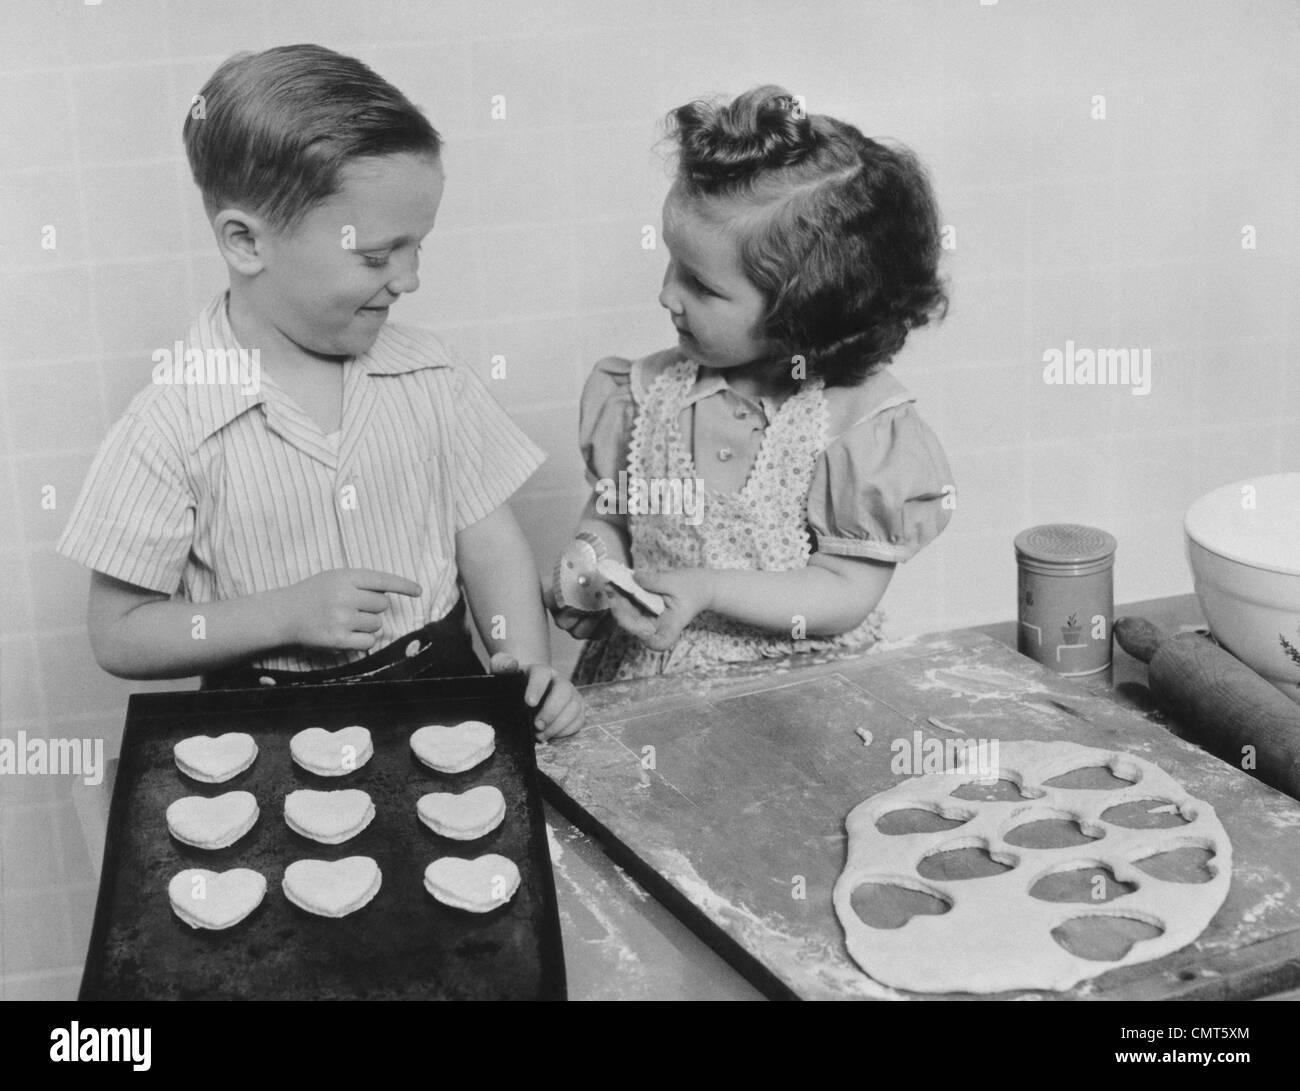 1940 YOUNG SMILING GIRL AND BOY BAKING COOKIES SAINT VALENTIN EN FORME DE COEUR Photo Stock